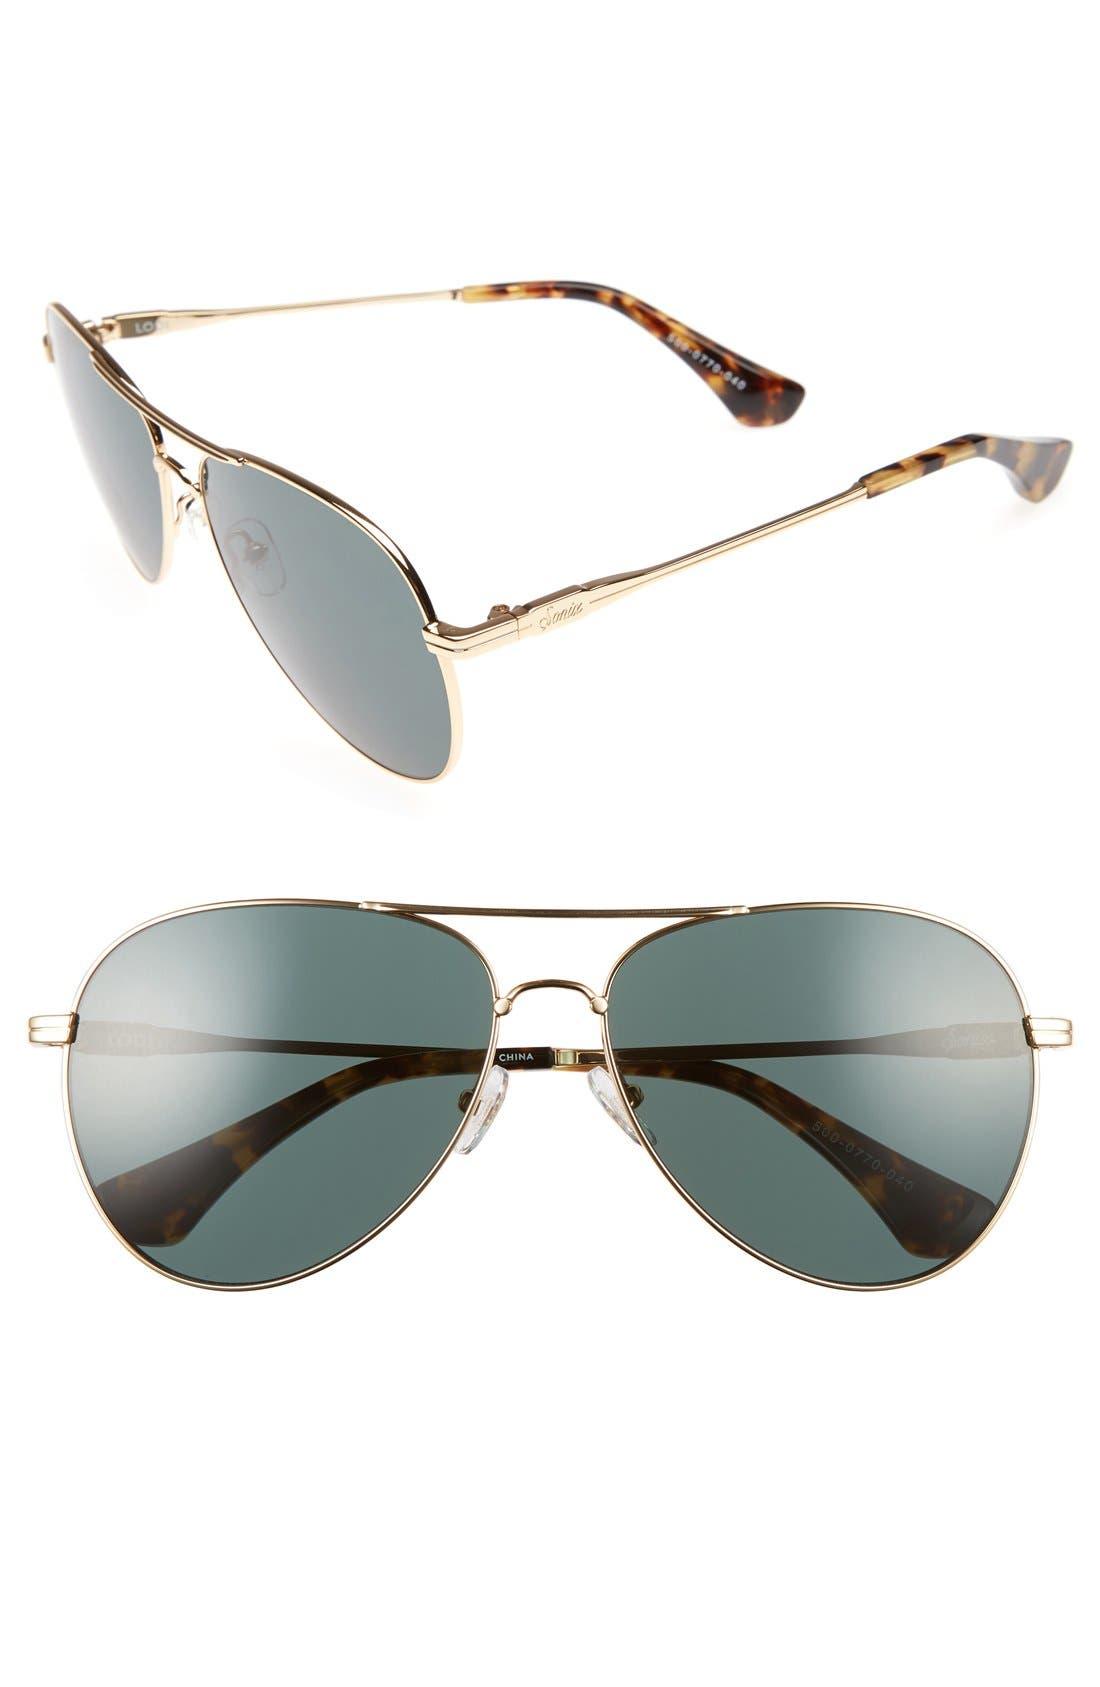 ac3fbc53c6c Sonix Lodi 62Mm Mirrored Aviator Sunglasses - Green Tint  Gold ...